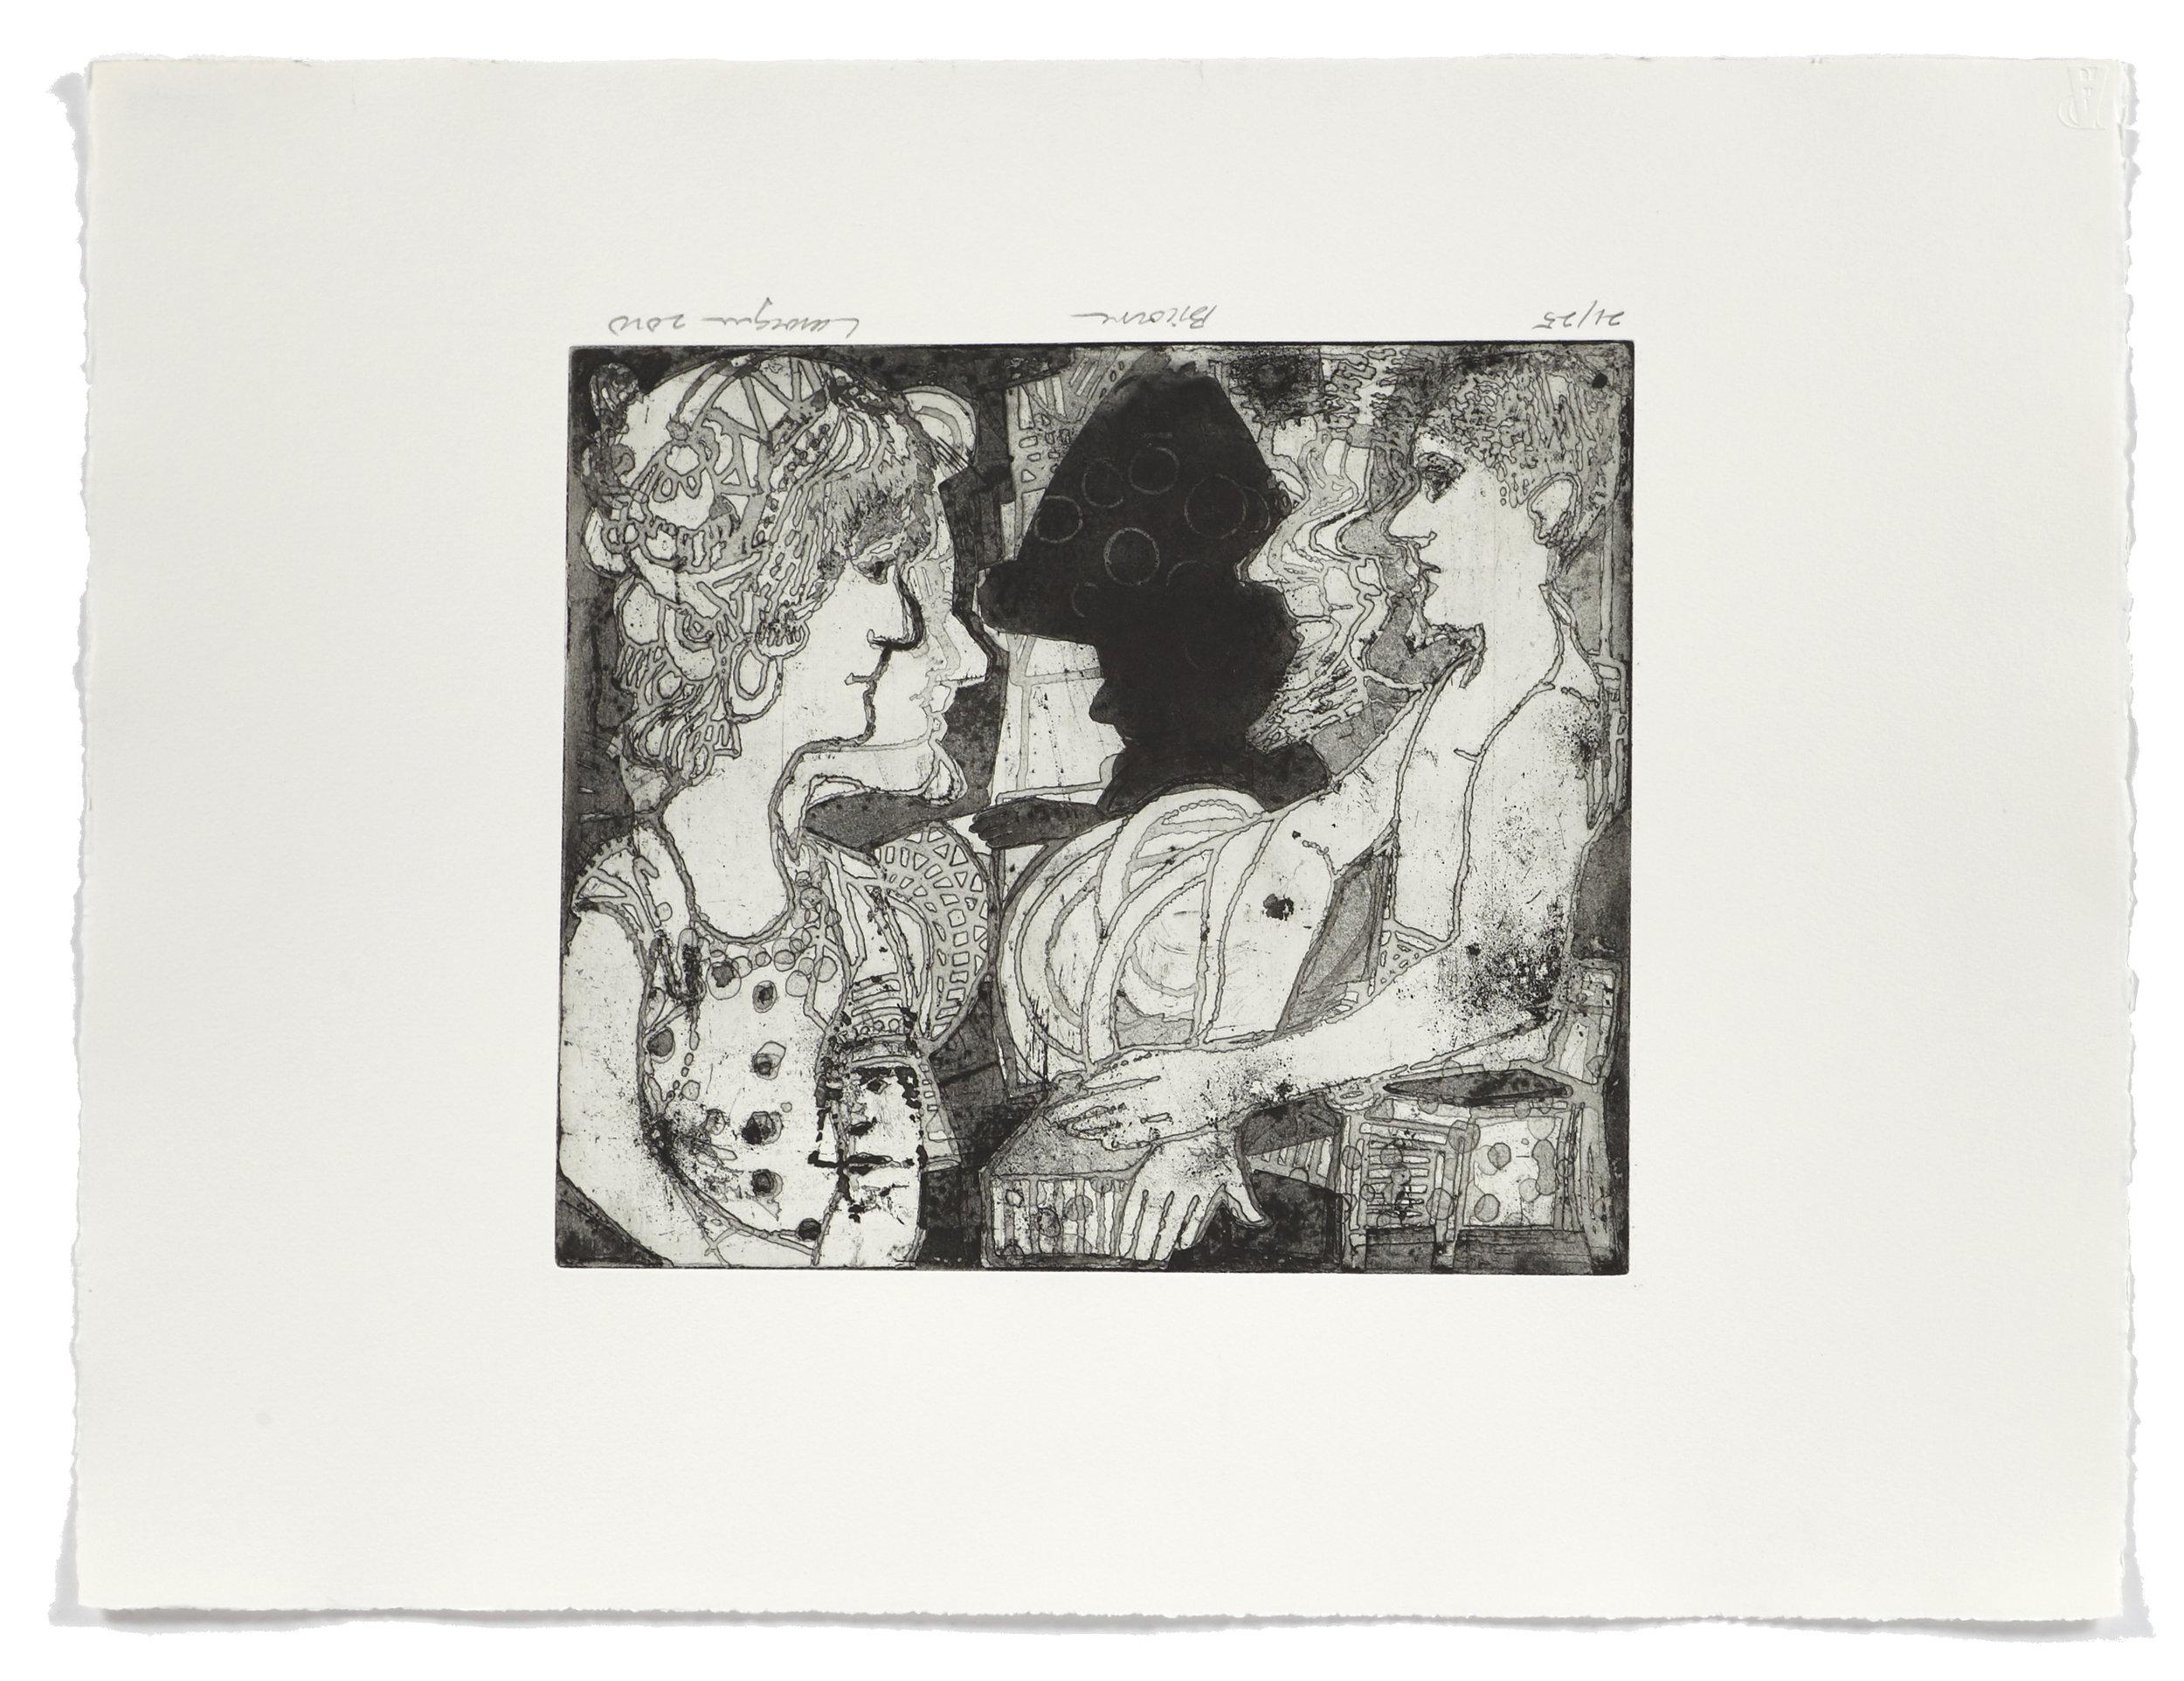 Bicorne   2010 | 50 x 65cm | Eau-forte and aquatint | 25 prints | Editor Atelier-Galerie A. Piroir